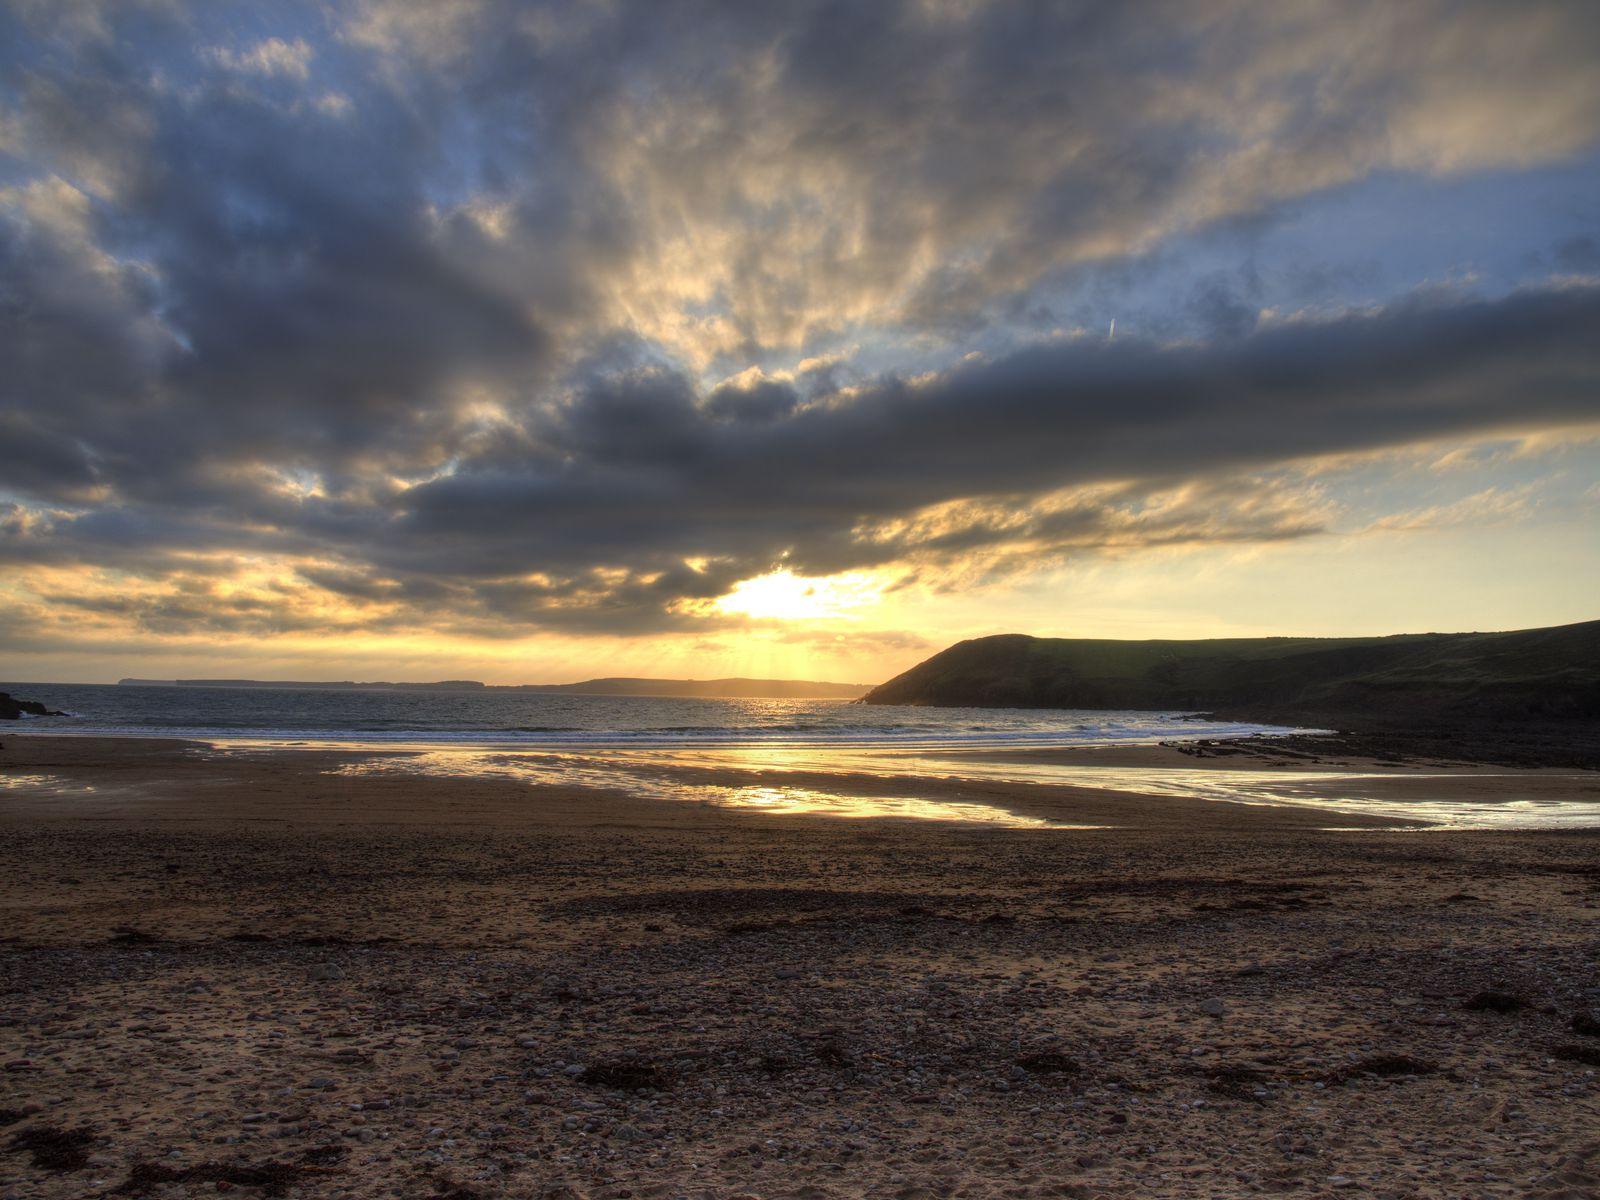 1600x1200 Wallpaper shore, water, sunset, landscape